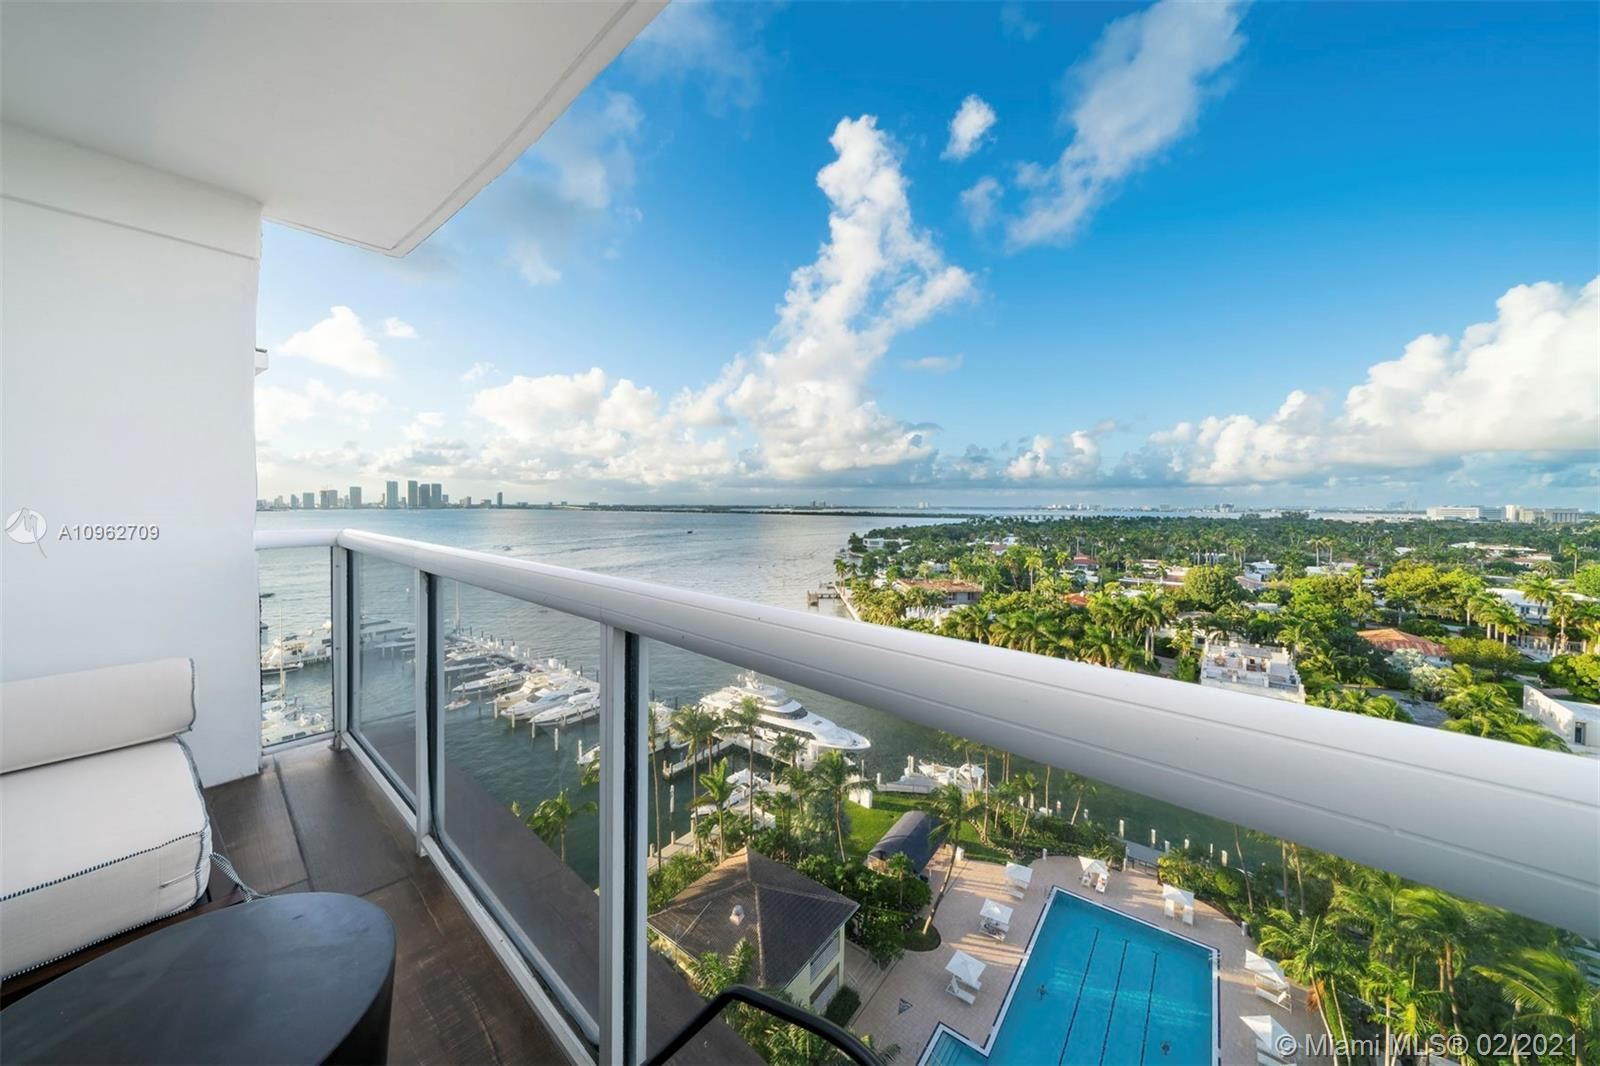 1900 Sunset Harbour #1501, Miami Beach, FL 33139 - #: A10962709